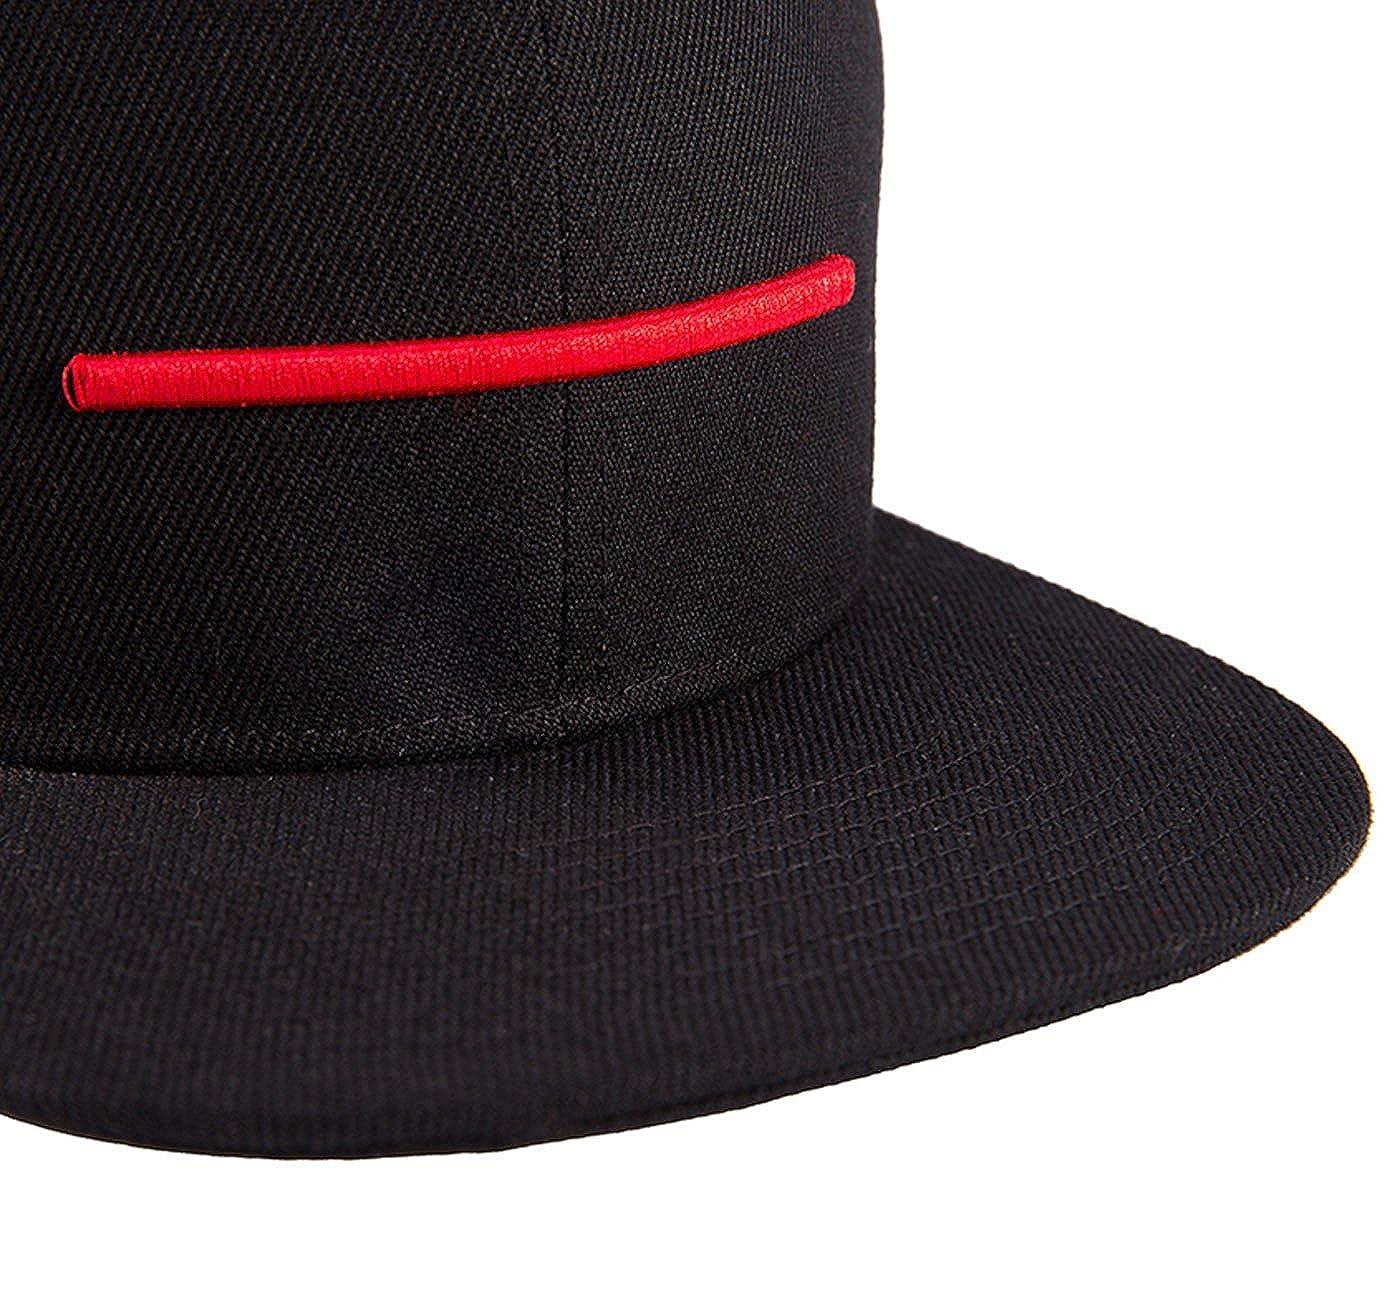 Wuke Snapback Gorra de Beisbol Hombre Cl á sico con Pico Plano Rojo ... 96f10e948bf